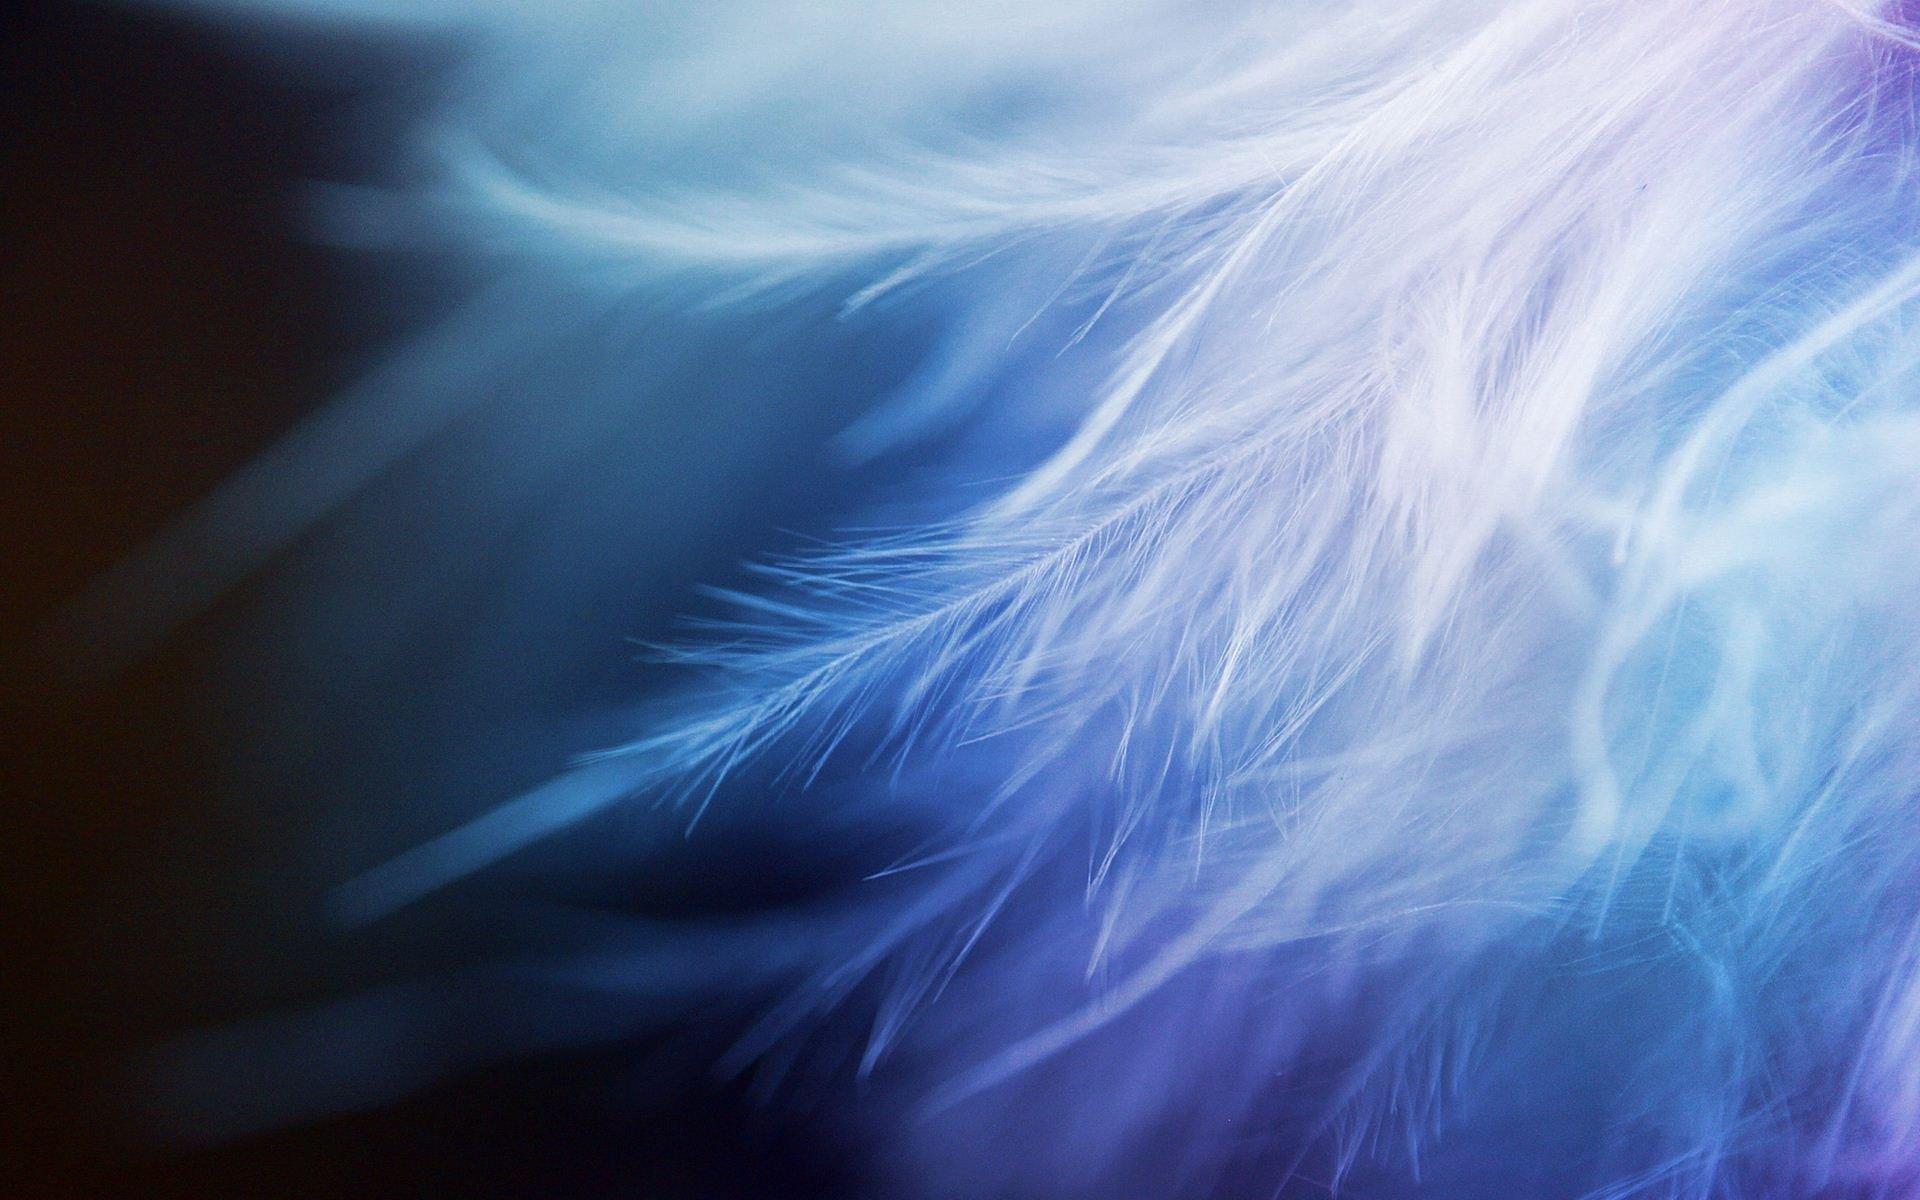 White Feather Closeup wallpaper 1920x1200 726850 1920x1200